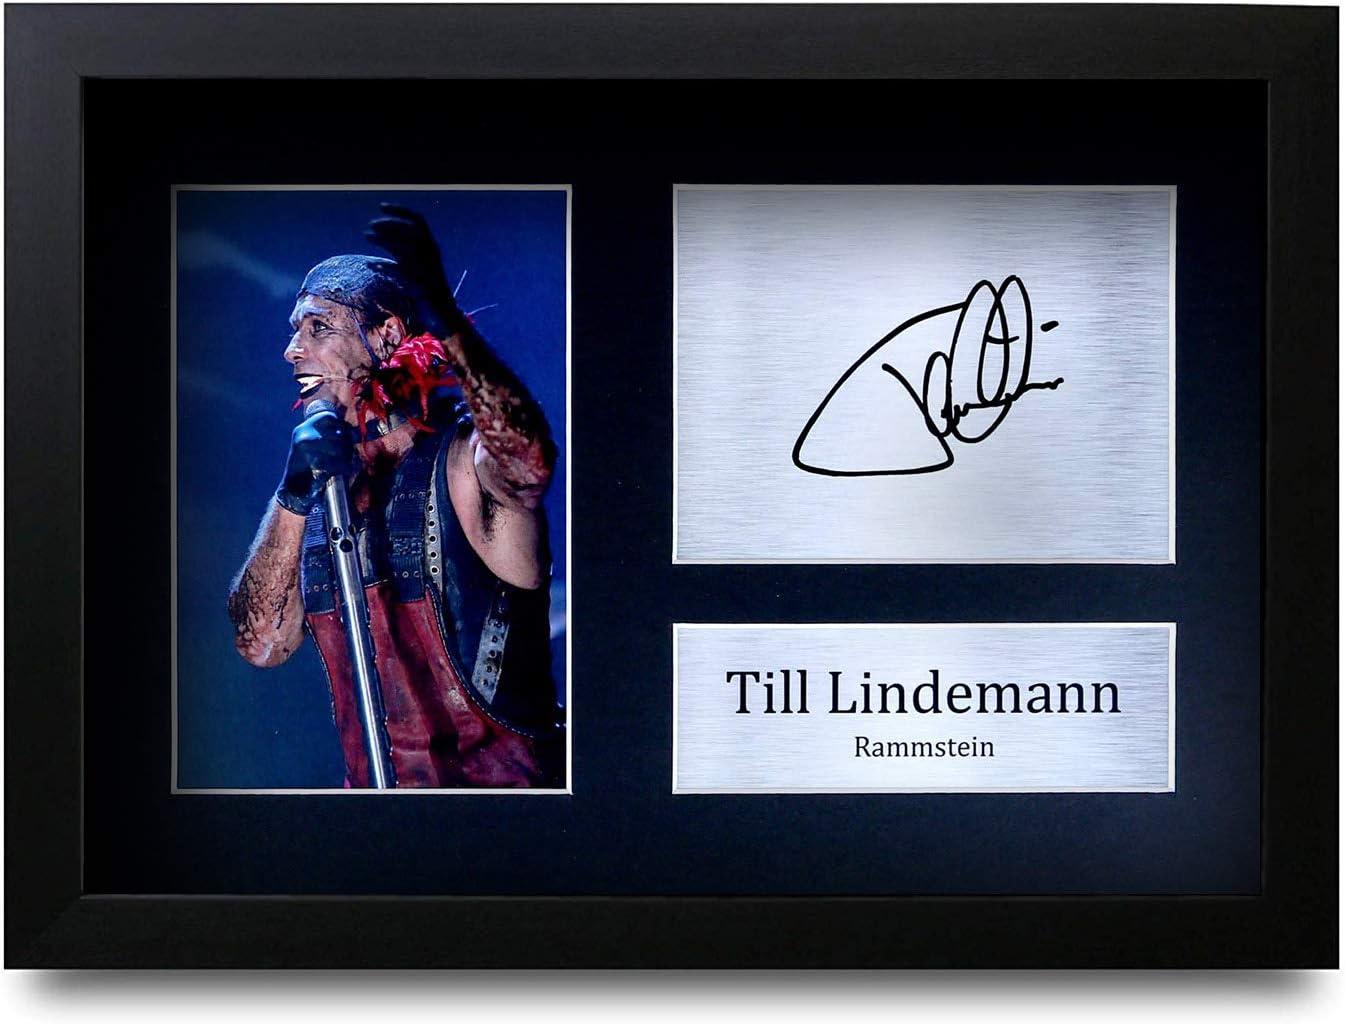 Till Lindemann A4 A4 Framed signiertes Autogramm f/ür Fans von Musik-Andenken HWC Trading Till Lindemann Rammstein Geschenke